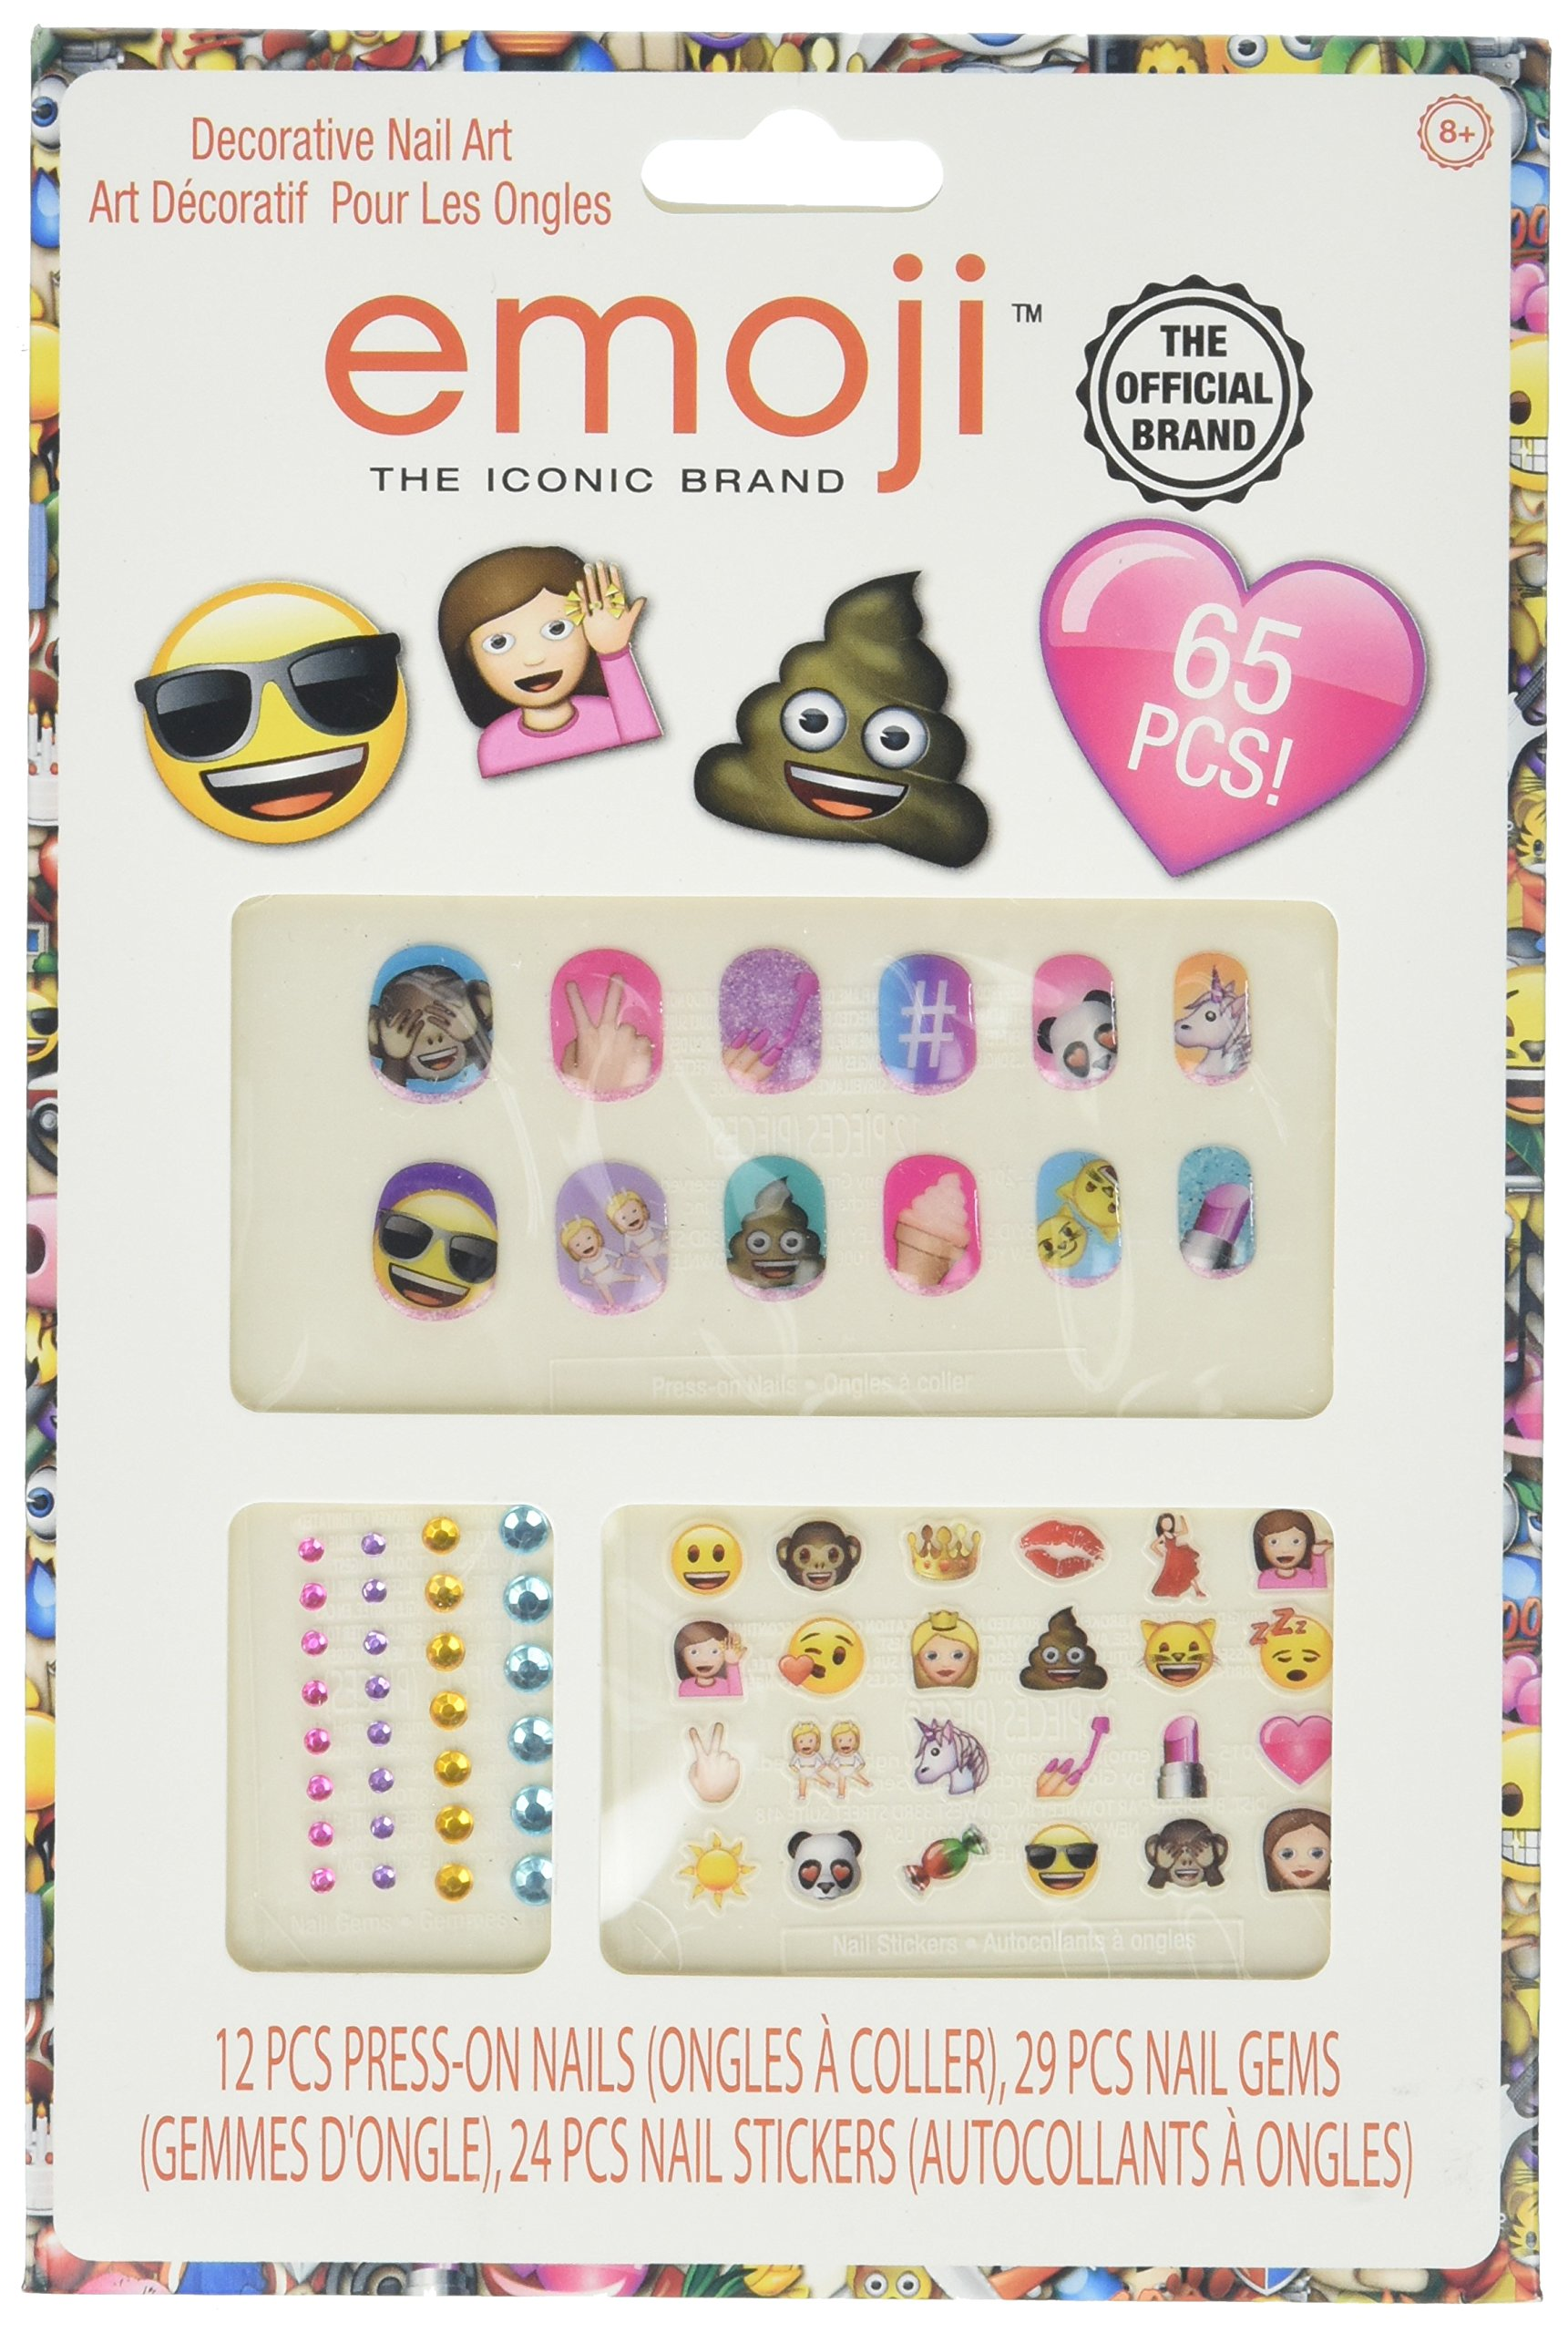 Amazon.com: NPW-USA Get Emojinal Nail Art Sticker Decals